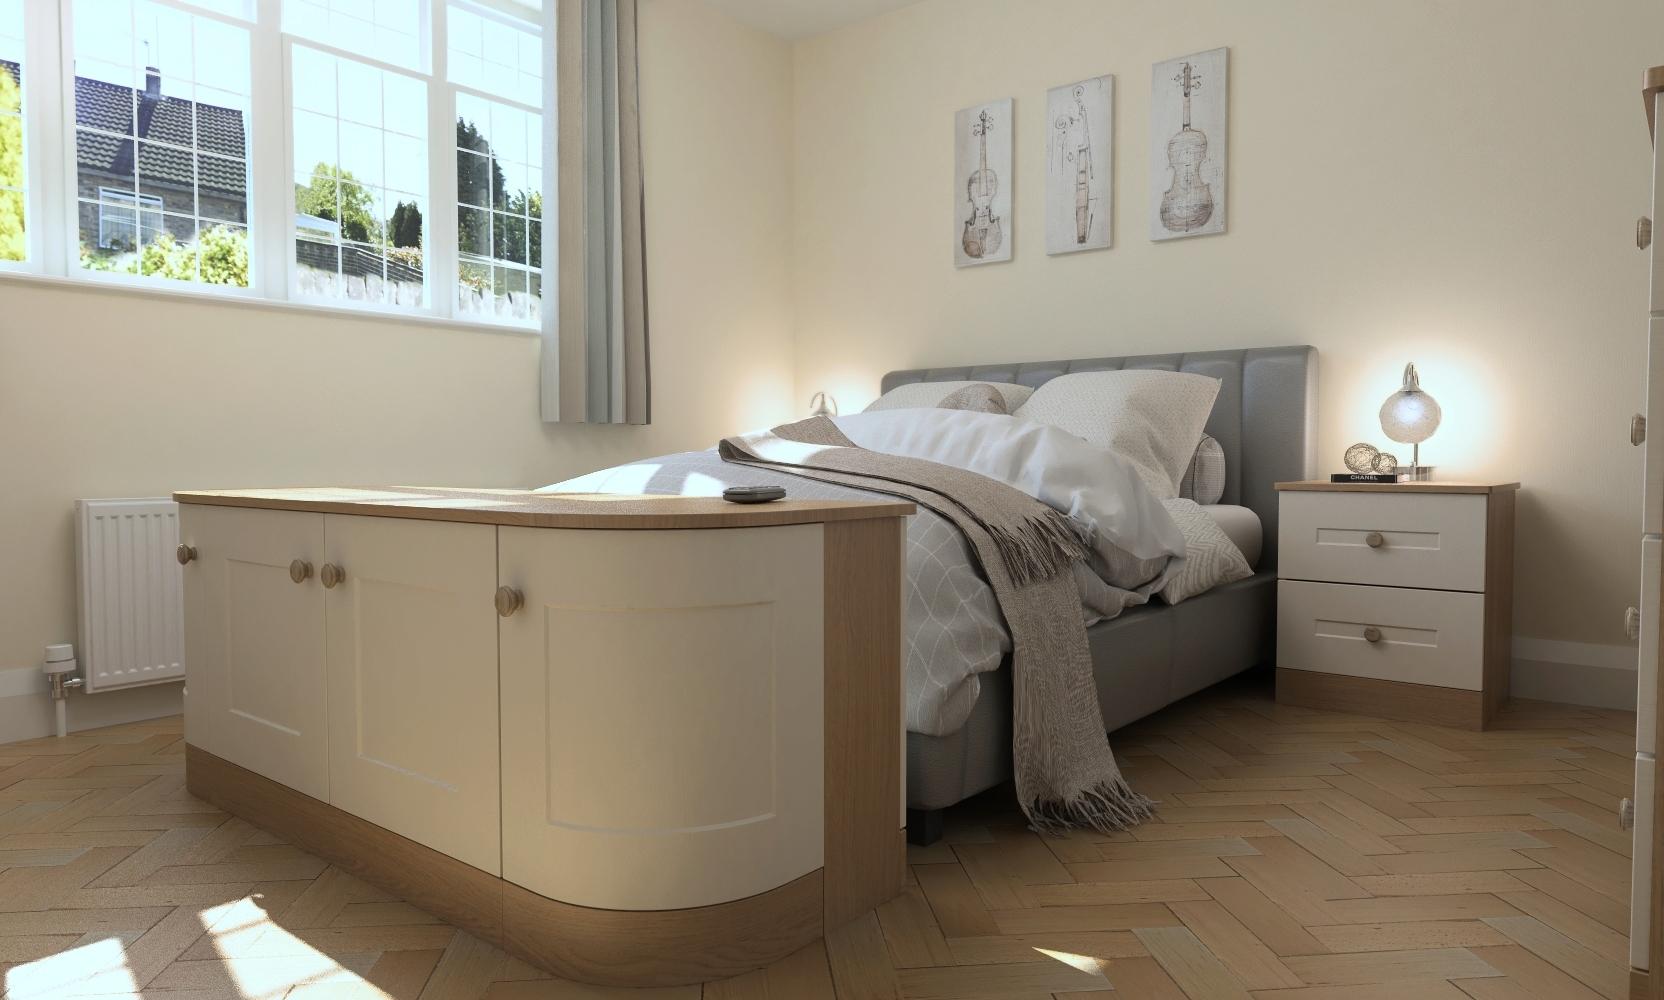 Browns 2000 Matfen Ivory Oak & Lissa Oak Vinyl Bedroom Diggle14